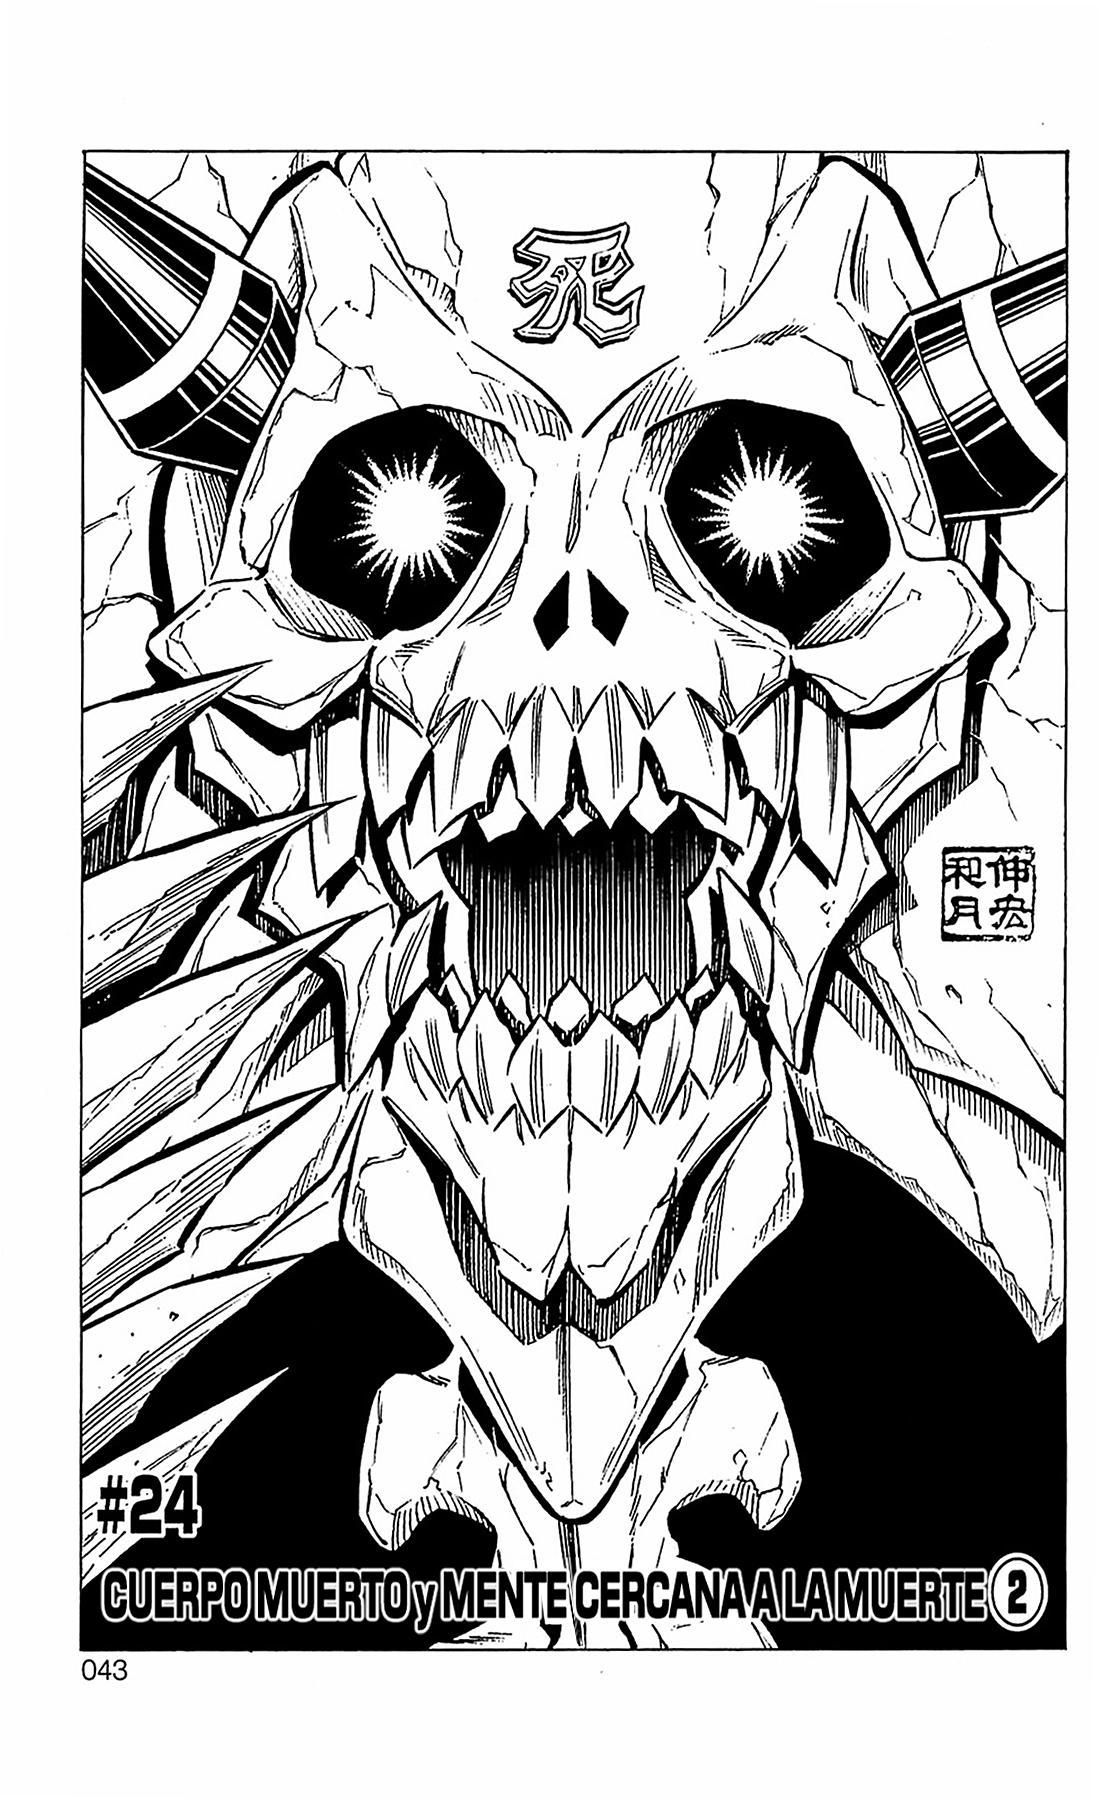 http://c5.ninemanga.com/es_manga/45/18797/447915/7adf7e3474d1857cc588cefbc4d68f55.jpg Page 1